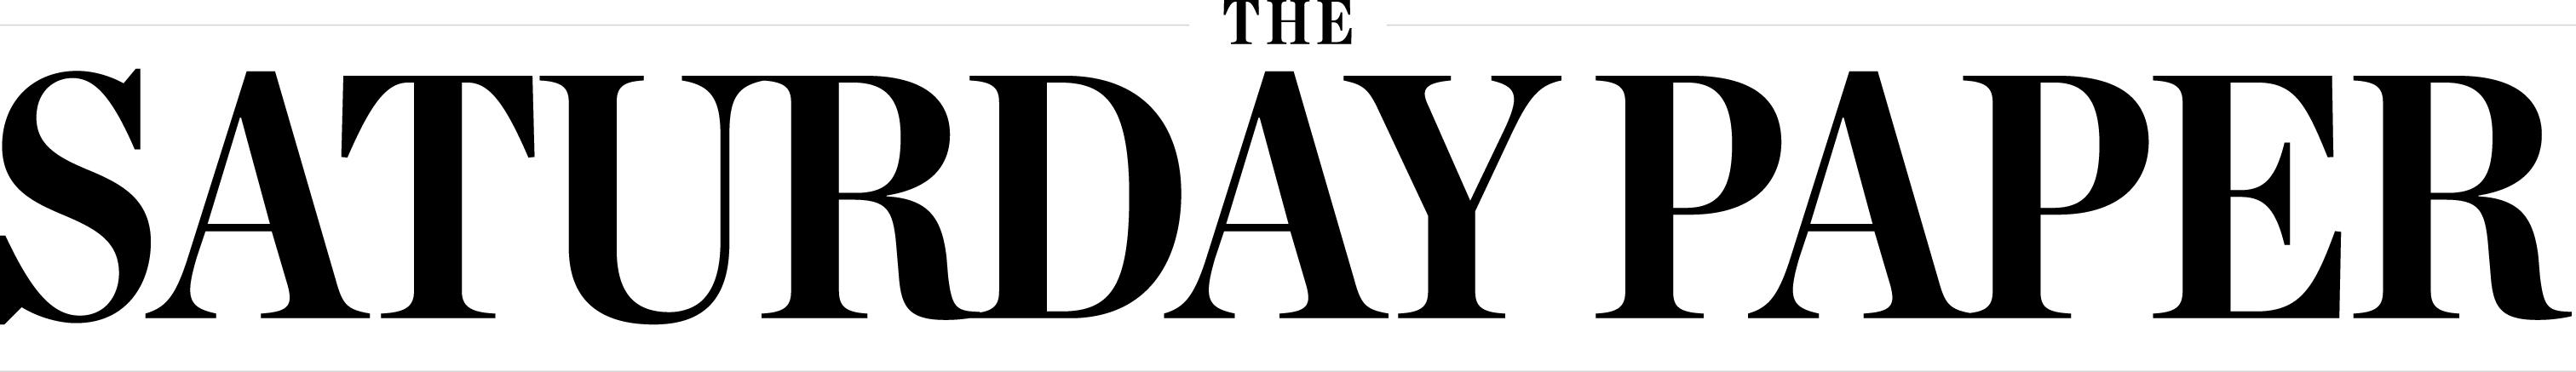 TheSaturdayPaper-logo-black